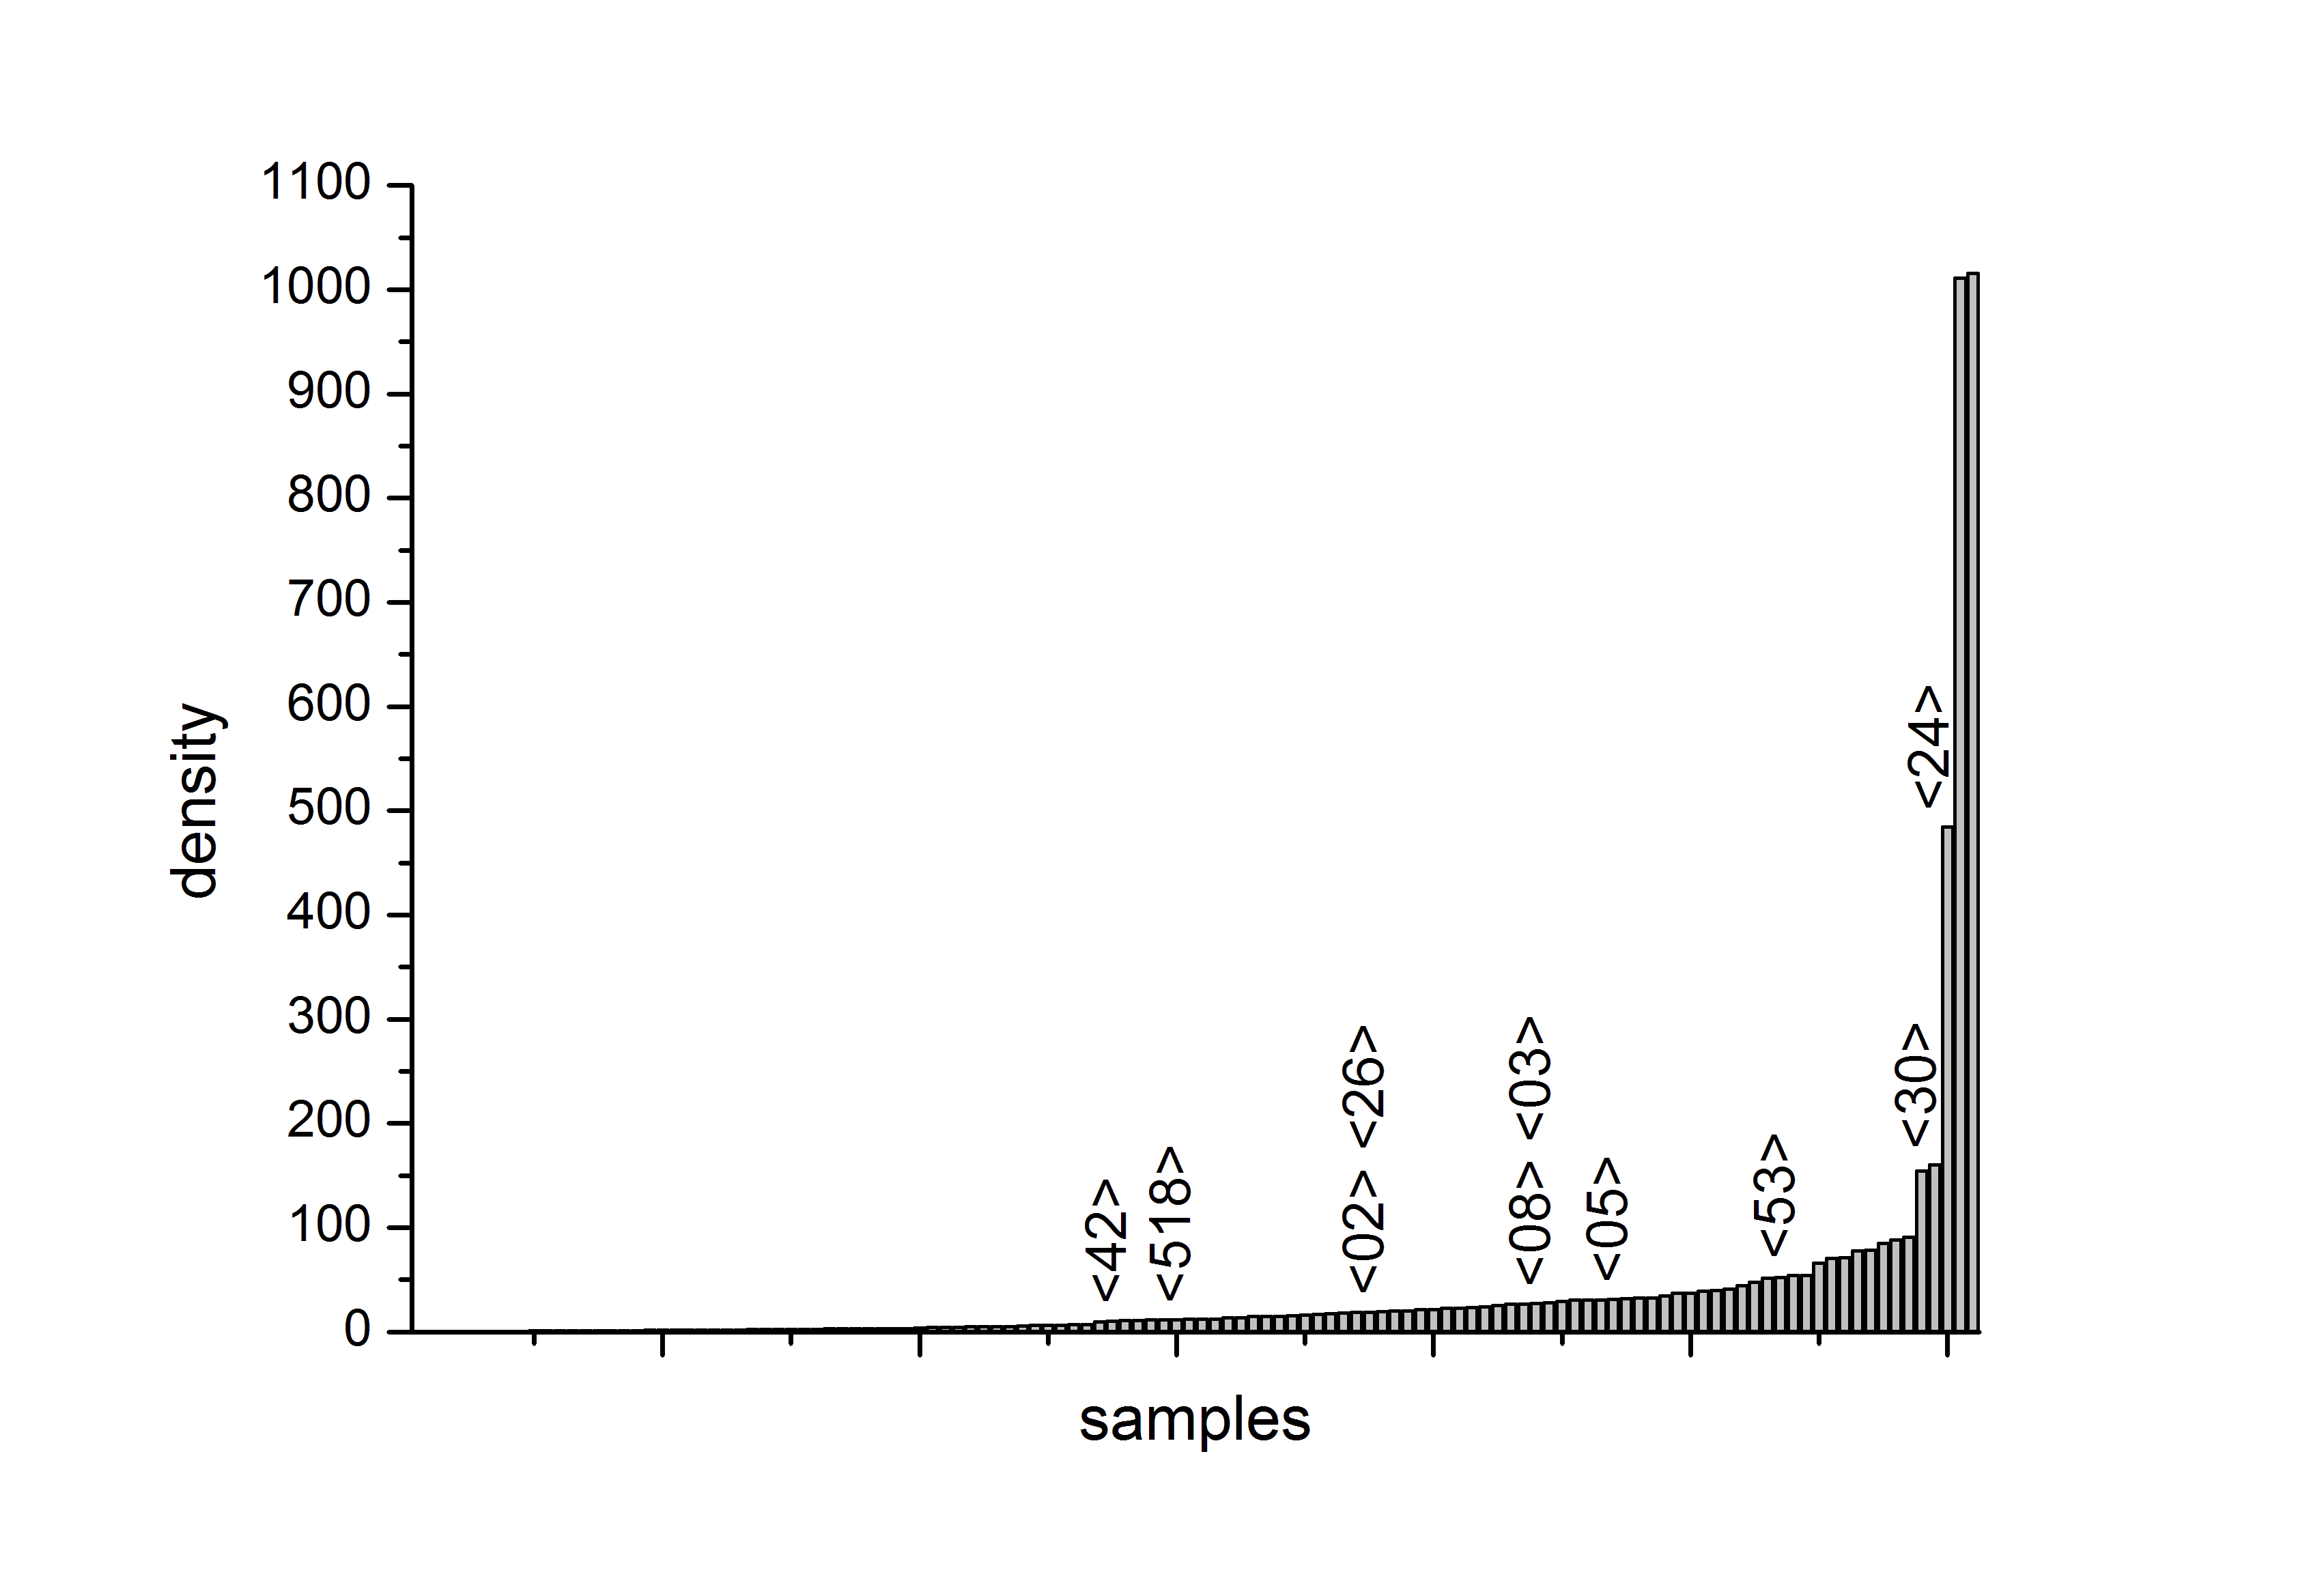 msax-density-lyminge